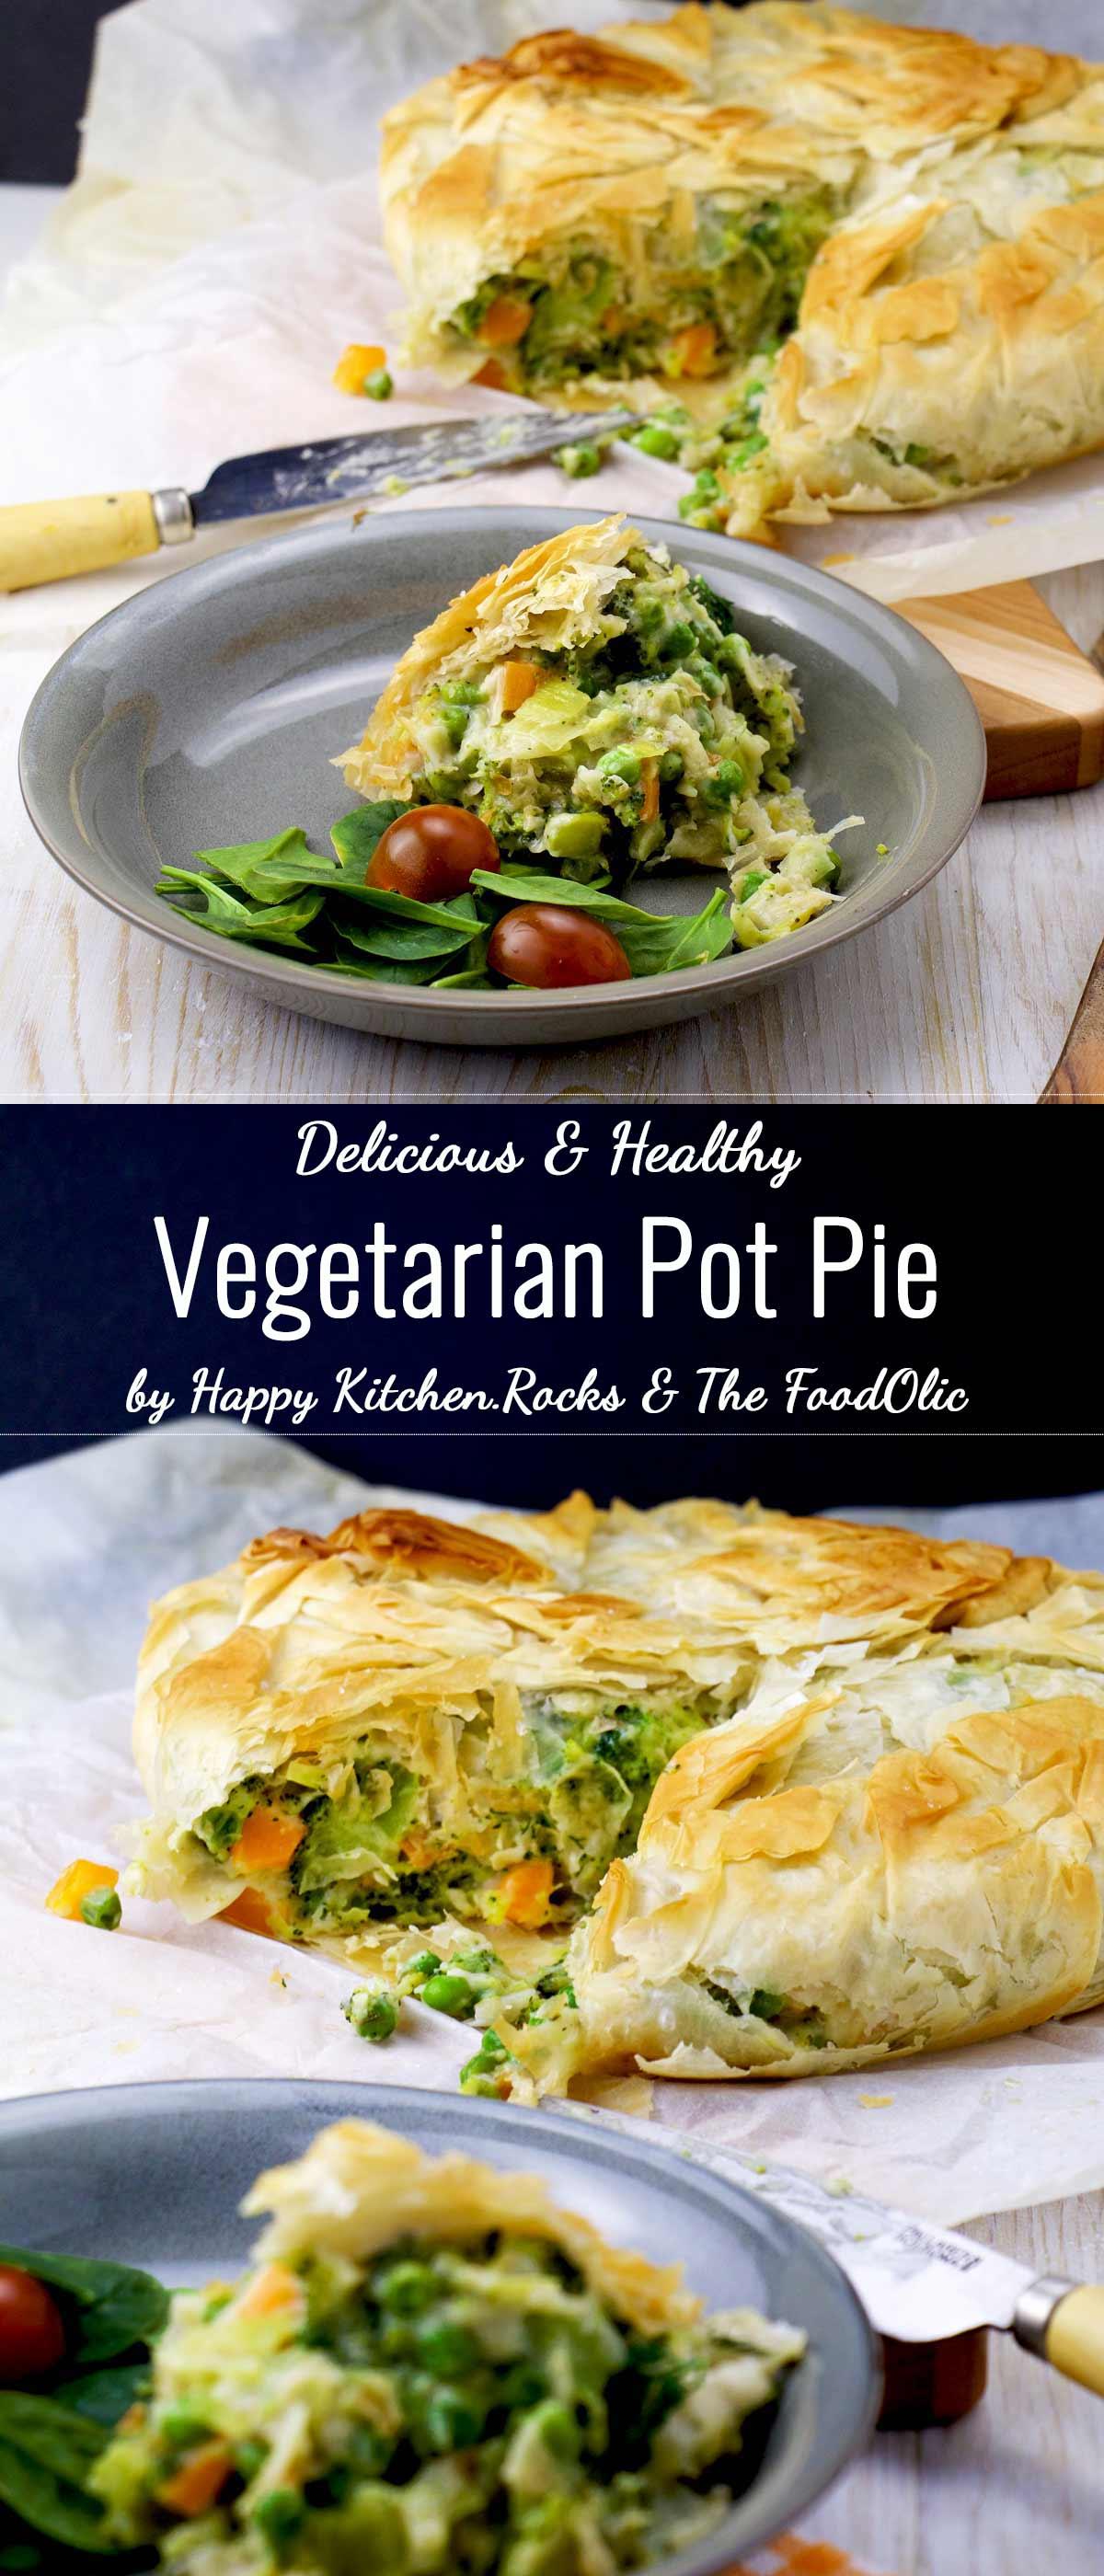 Healthy Vegetarian Pot Pie Super Long Vertical Image